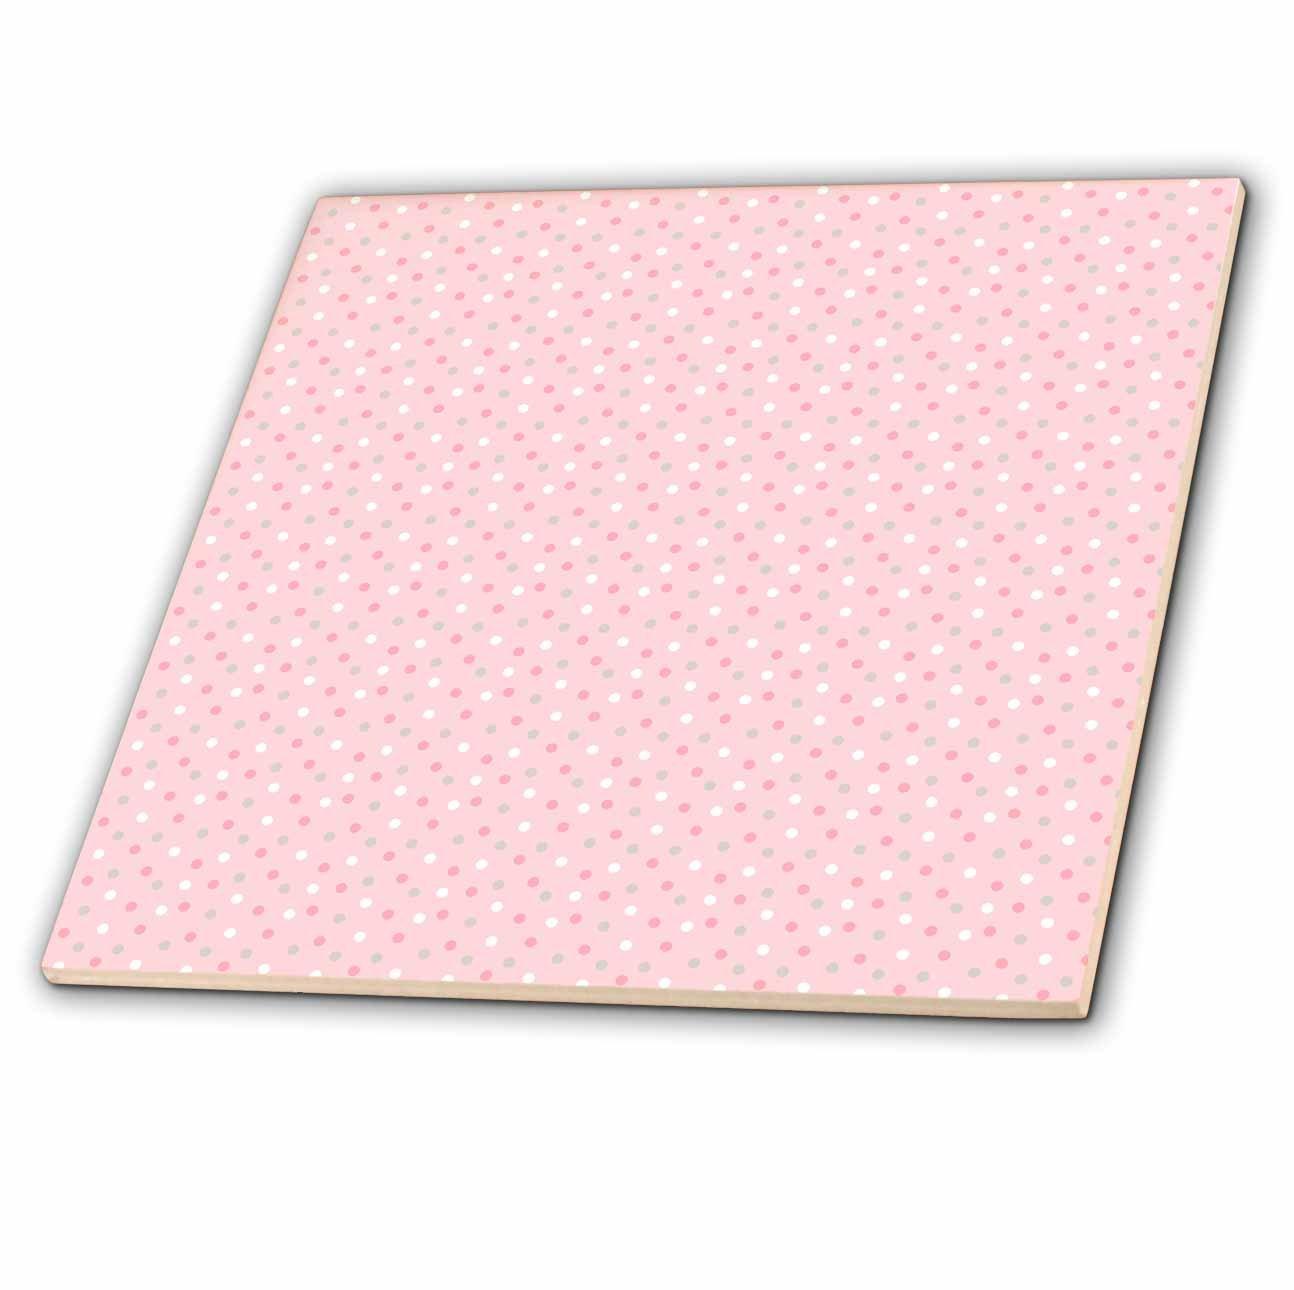 622ae9b21c322 Amazon.com: 3dRose Anne Marie Baugh - Patterns - Cute Pink, Gray ...